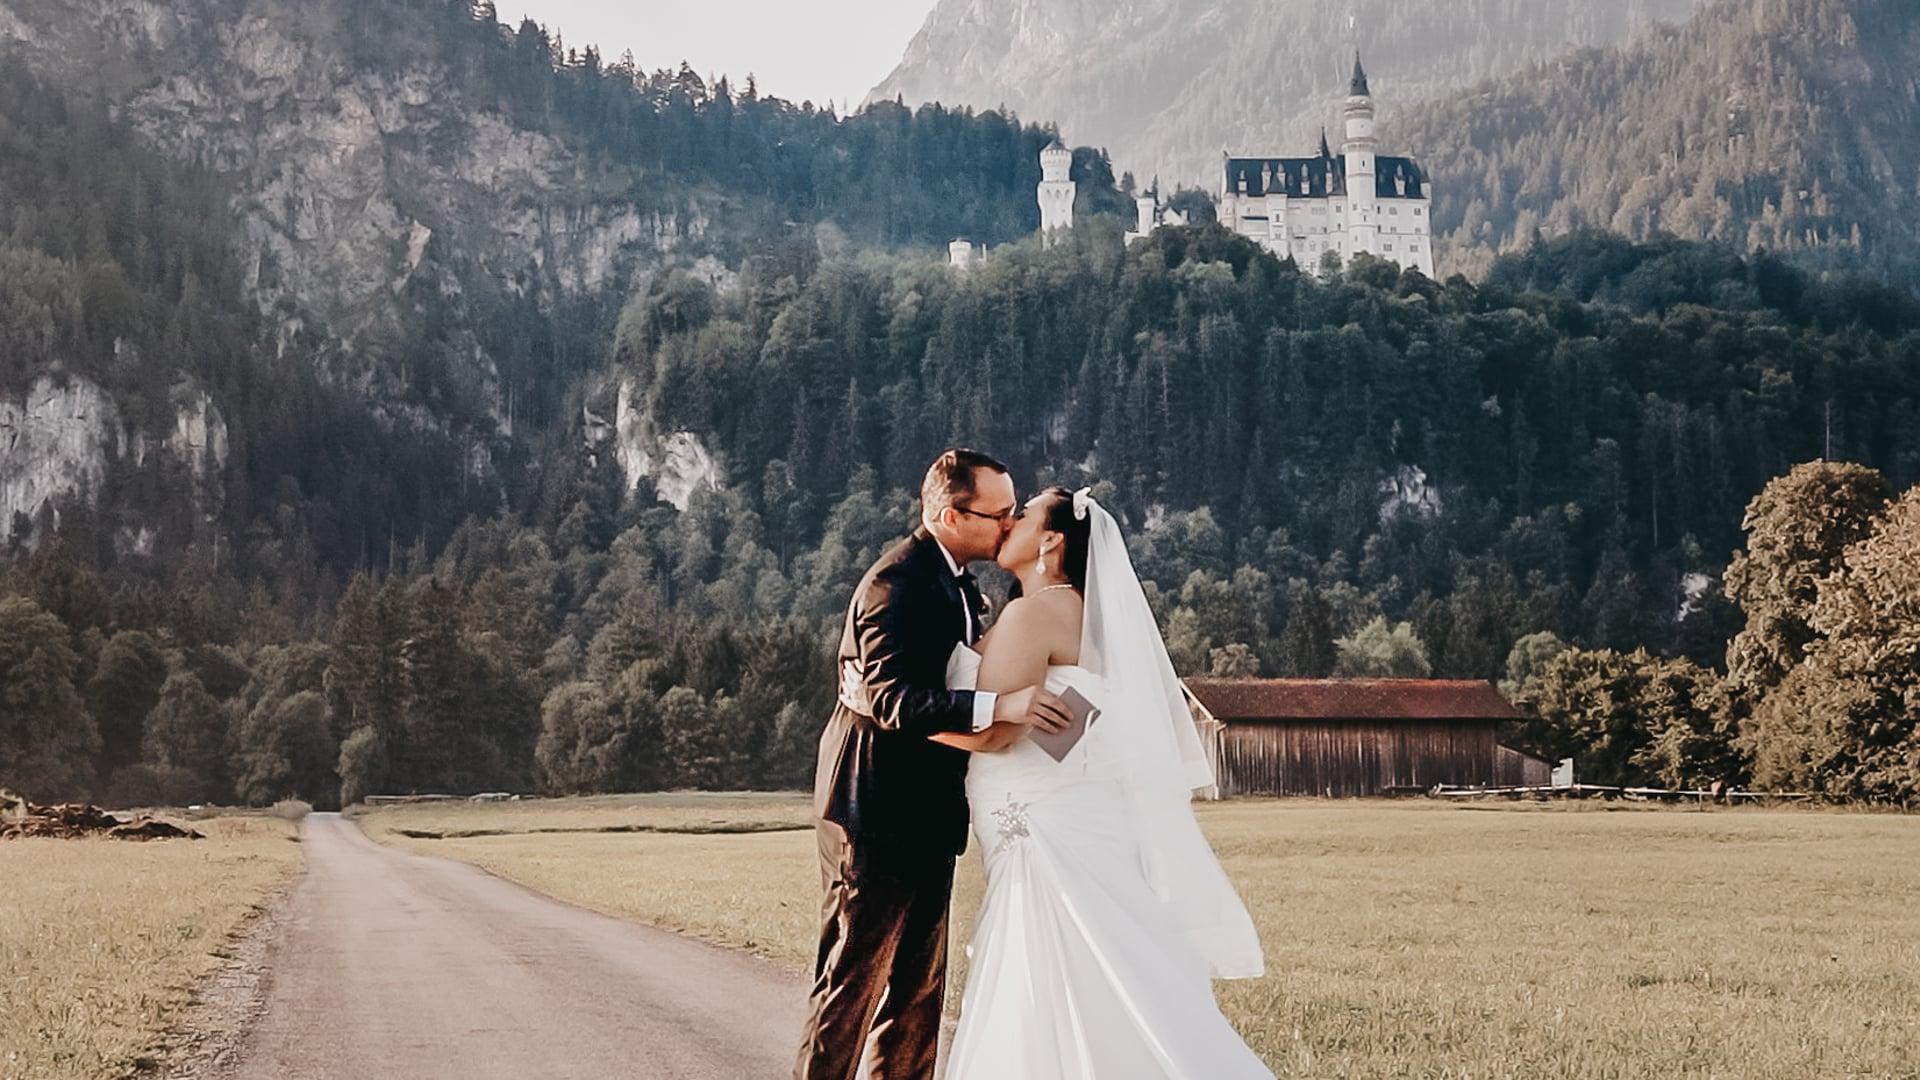 Robin & Patrick's Elopement Wedding Film